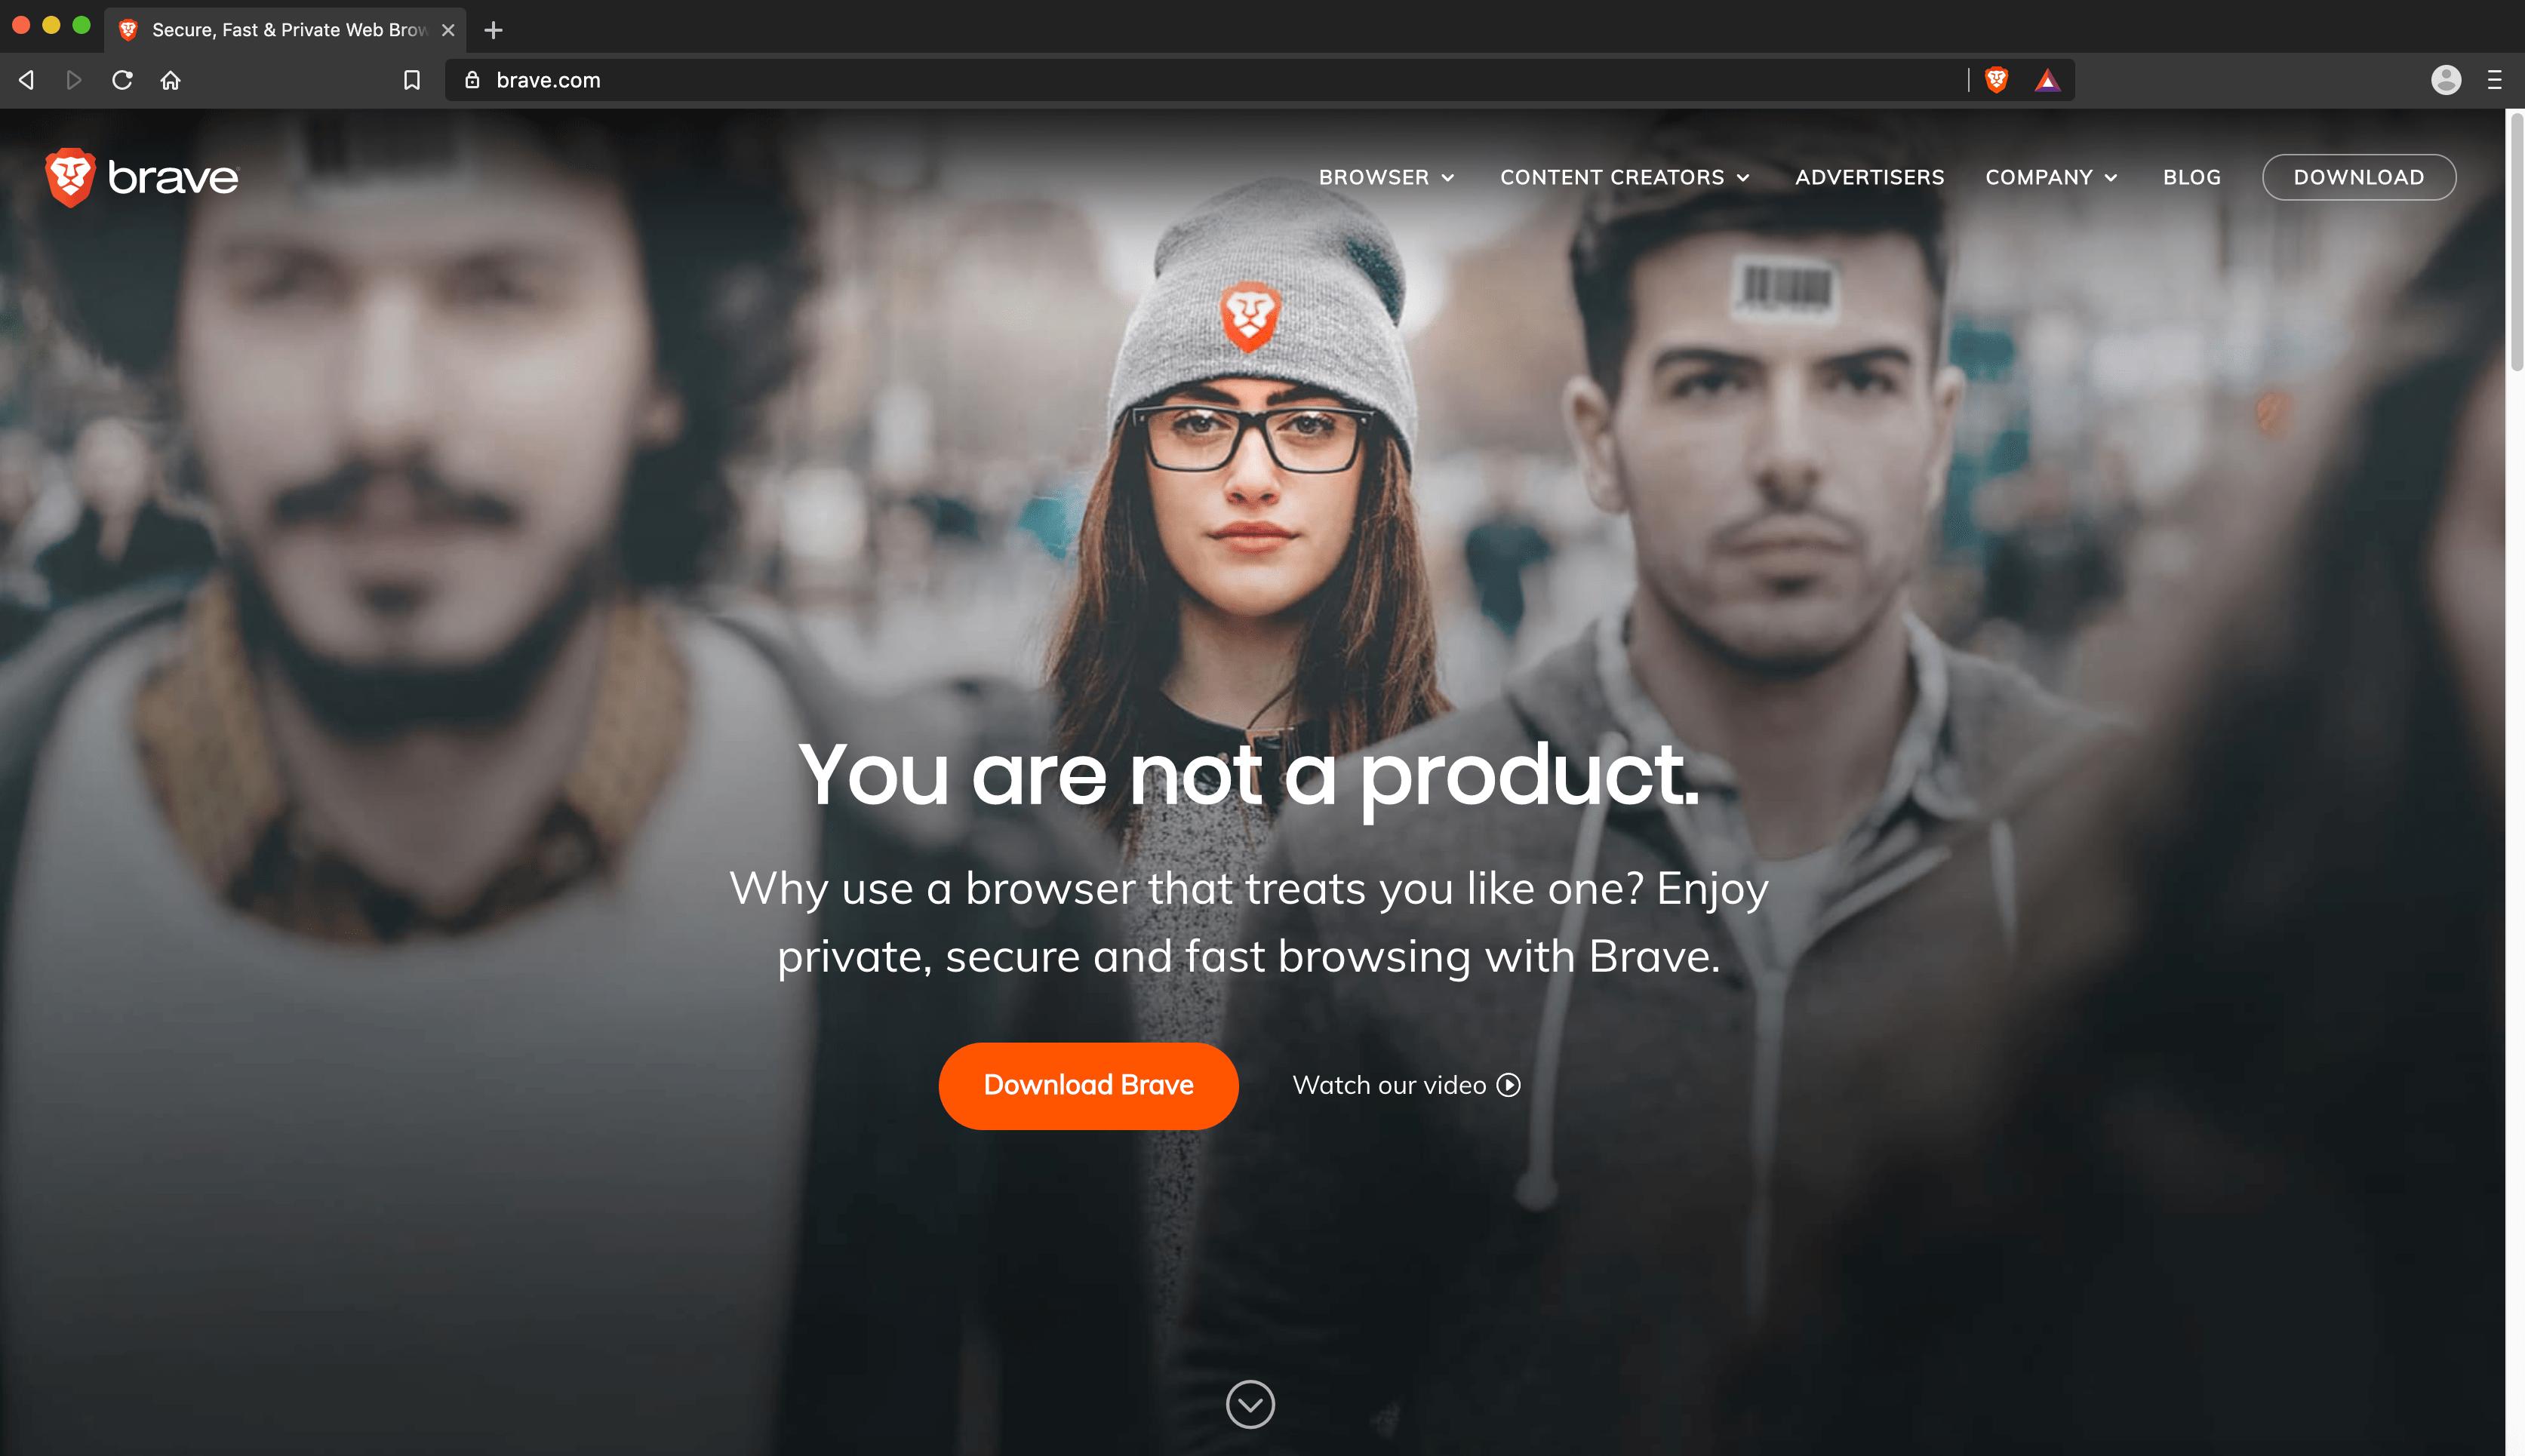 Brave homepage on Brave browser